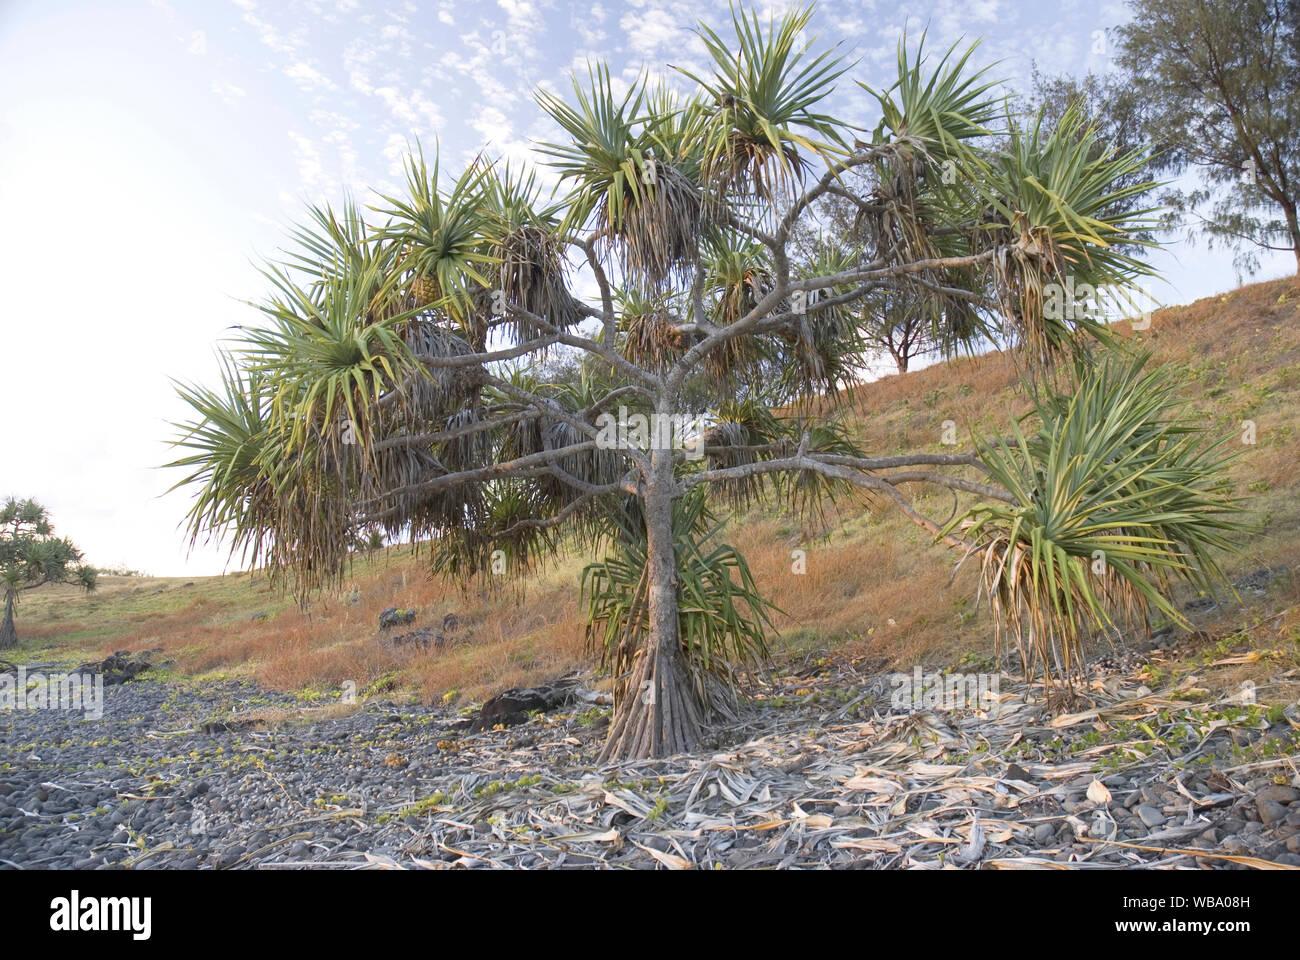 Thatch screwpine (Pandanus tectorius), a hardy sand- and salt-tolerant plant. Woongarra Marine Park, Queensland, Australia Stock Photo